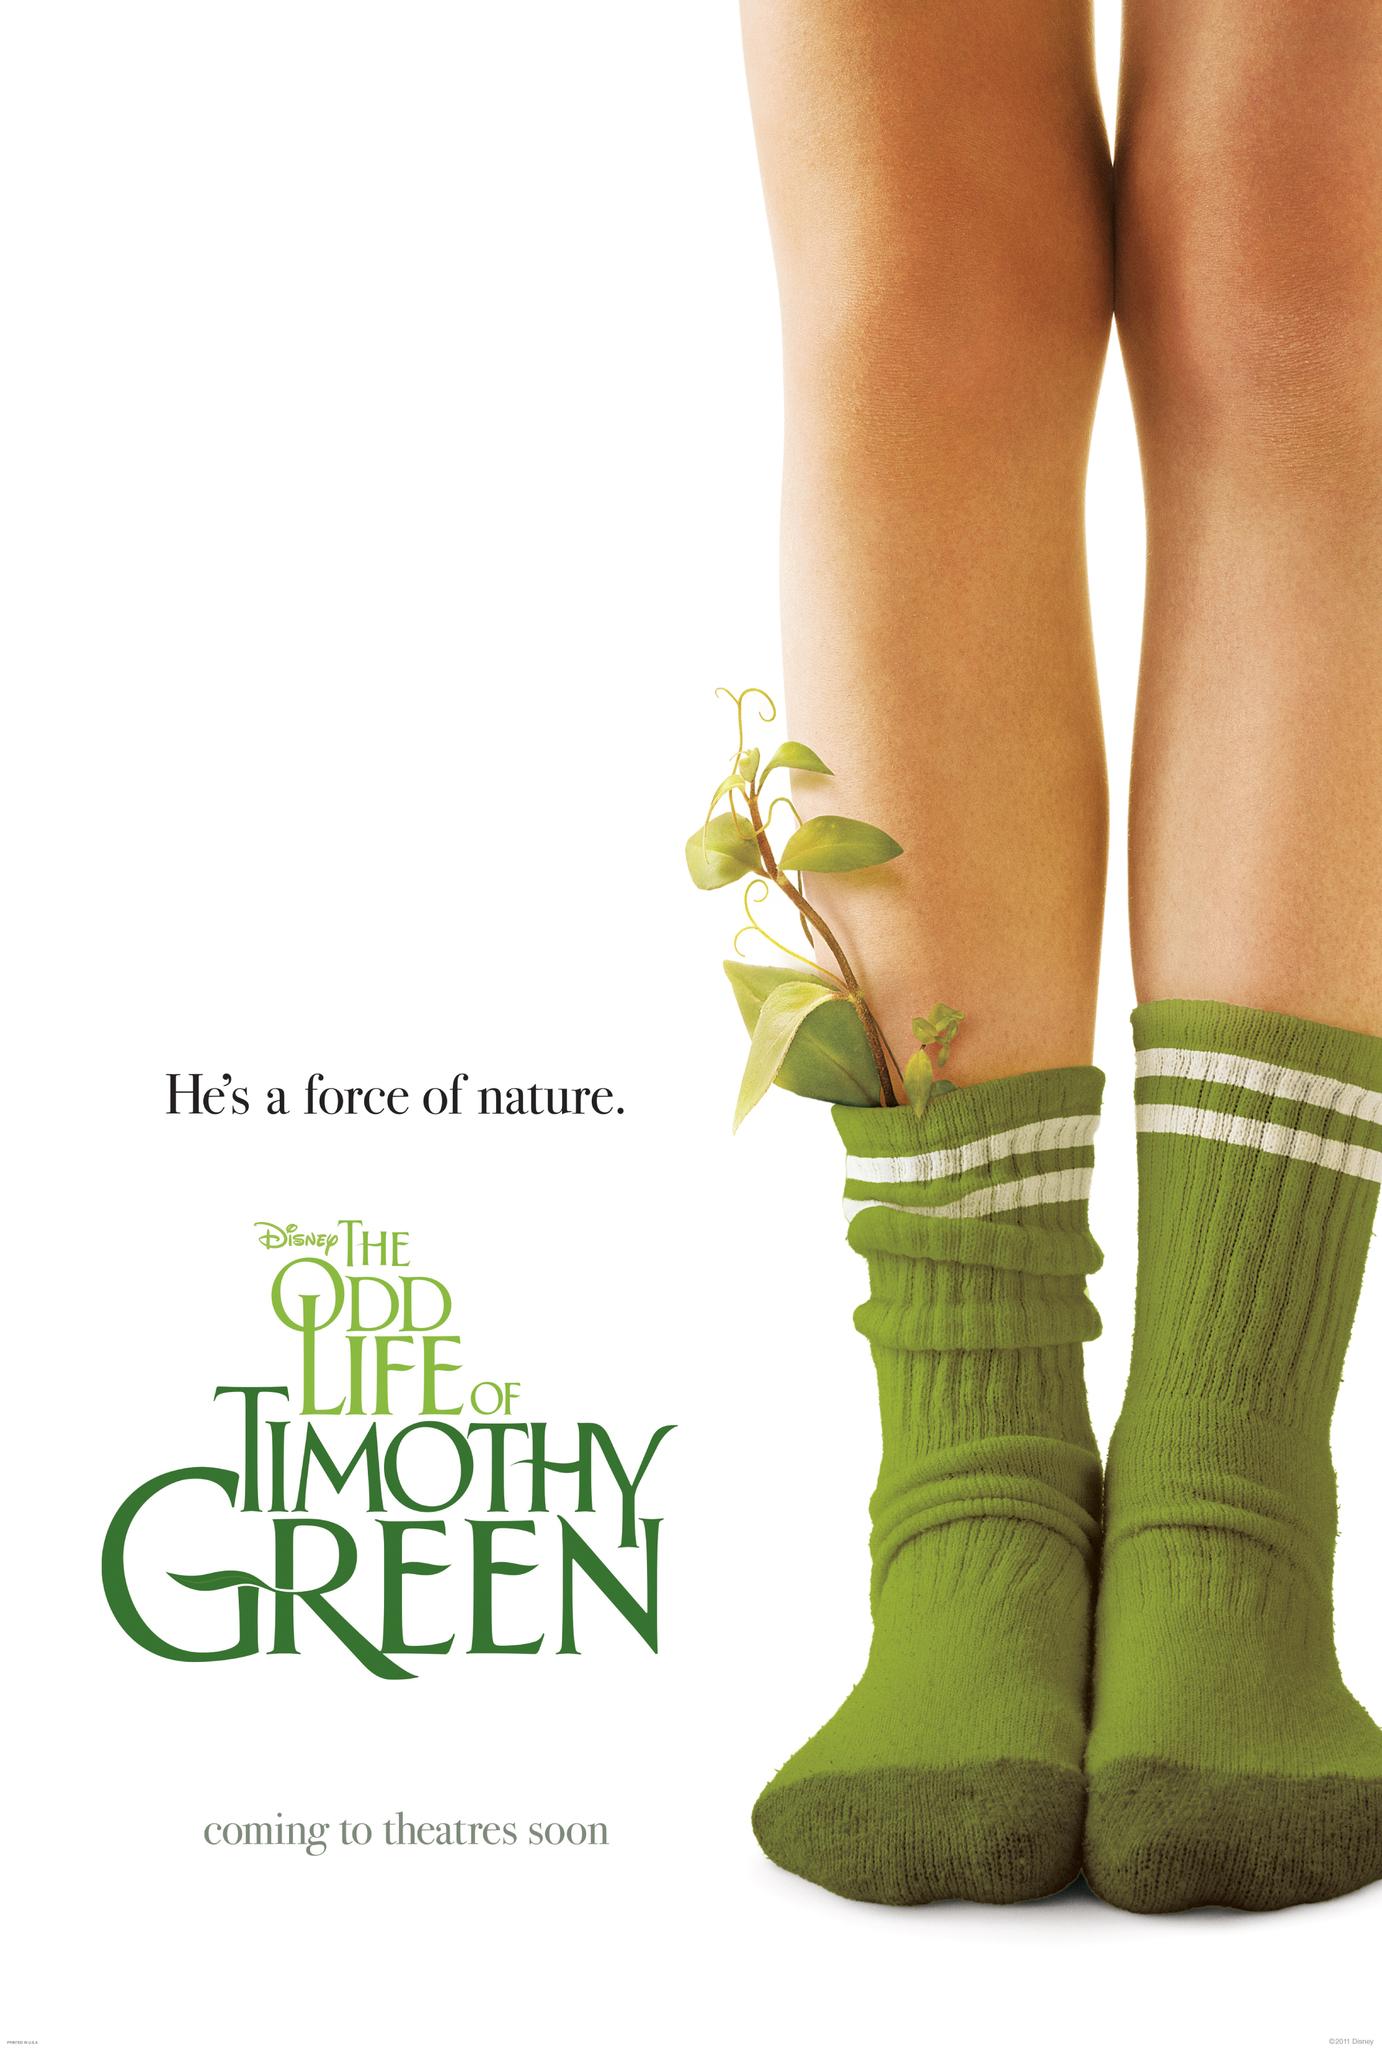 the odd life of timothy green 2012 imdb